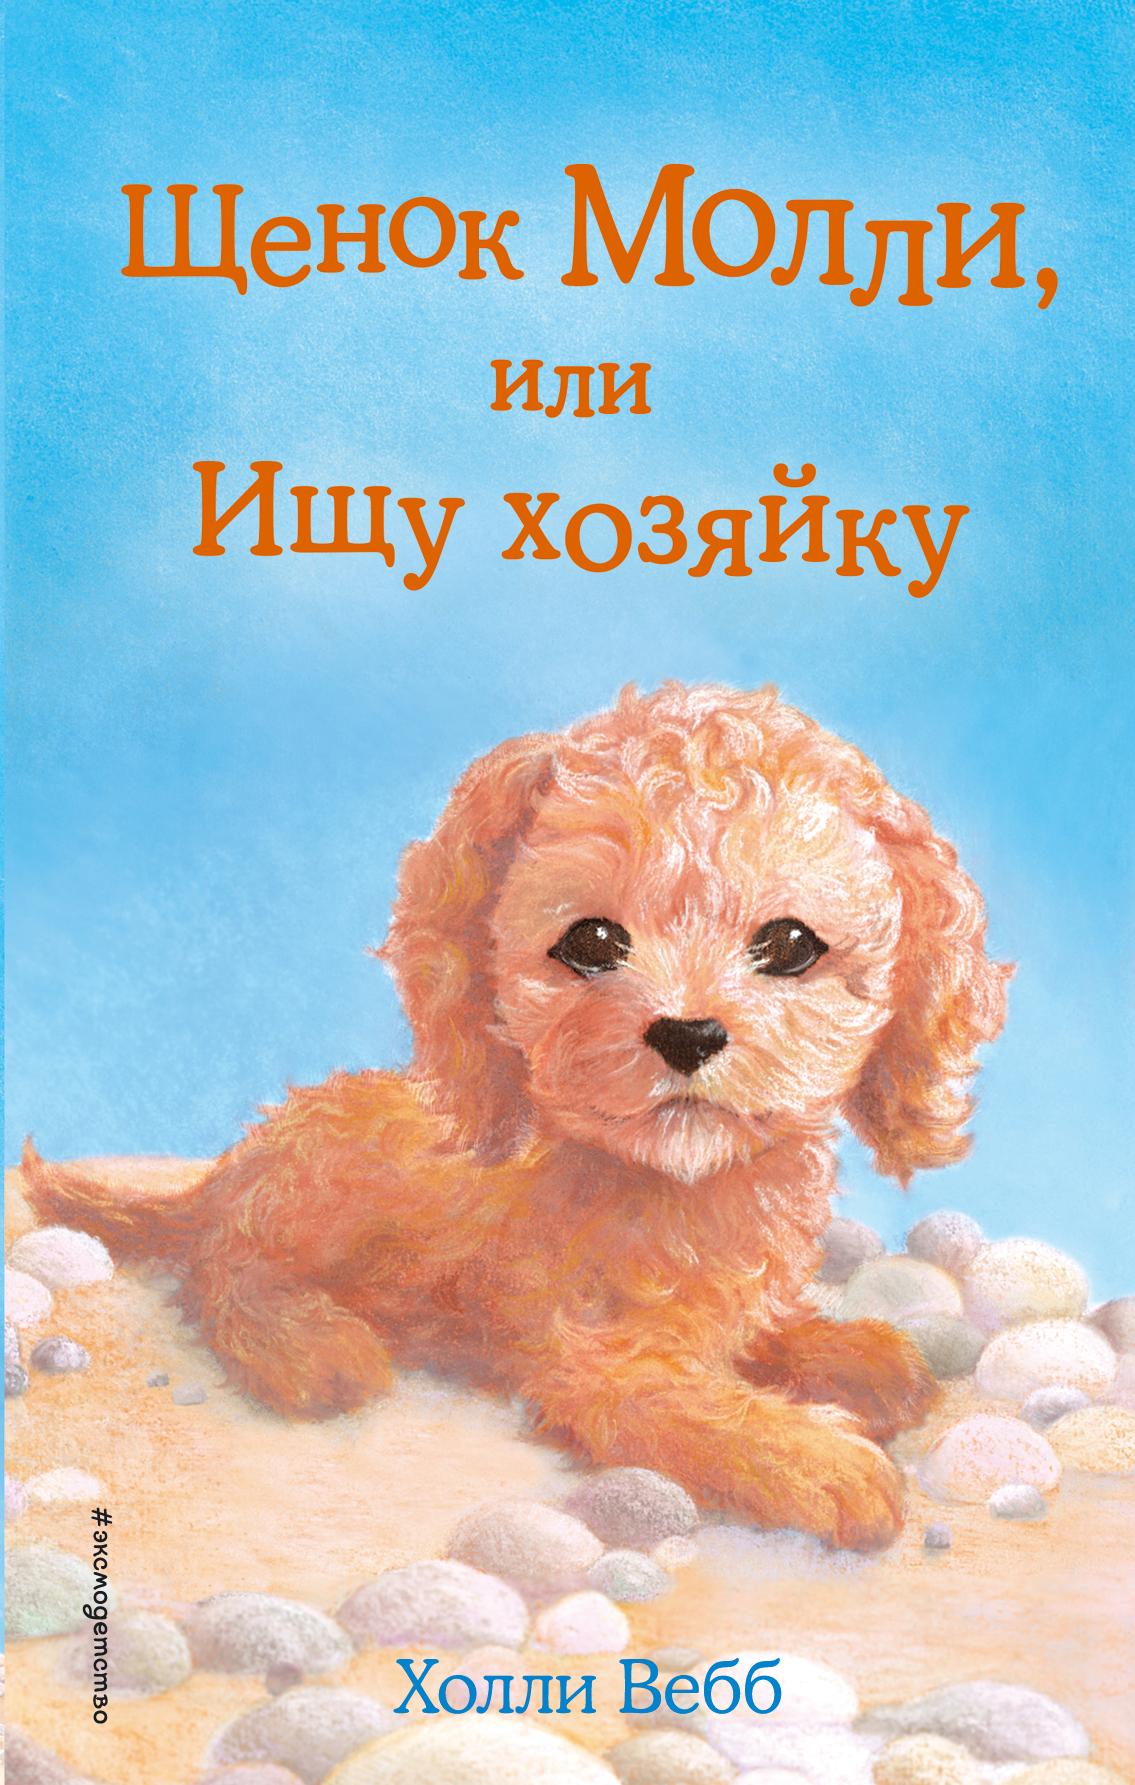 Холли Вебб Щенок Молли, или Ищу хозяйку холли вебб щенок молли или ищу хозяйку